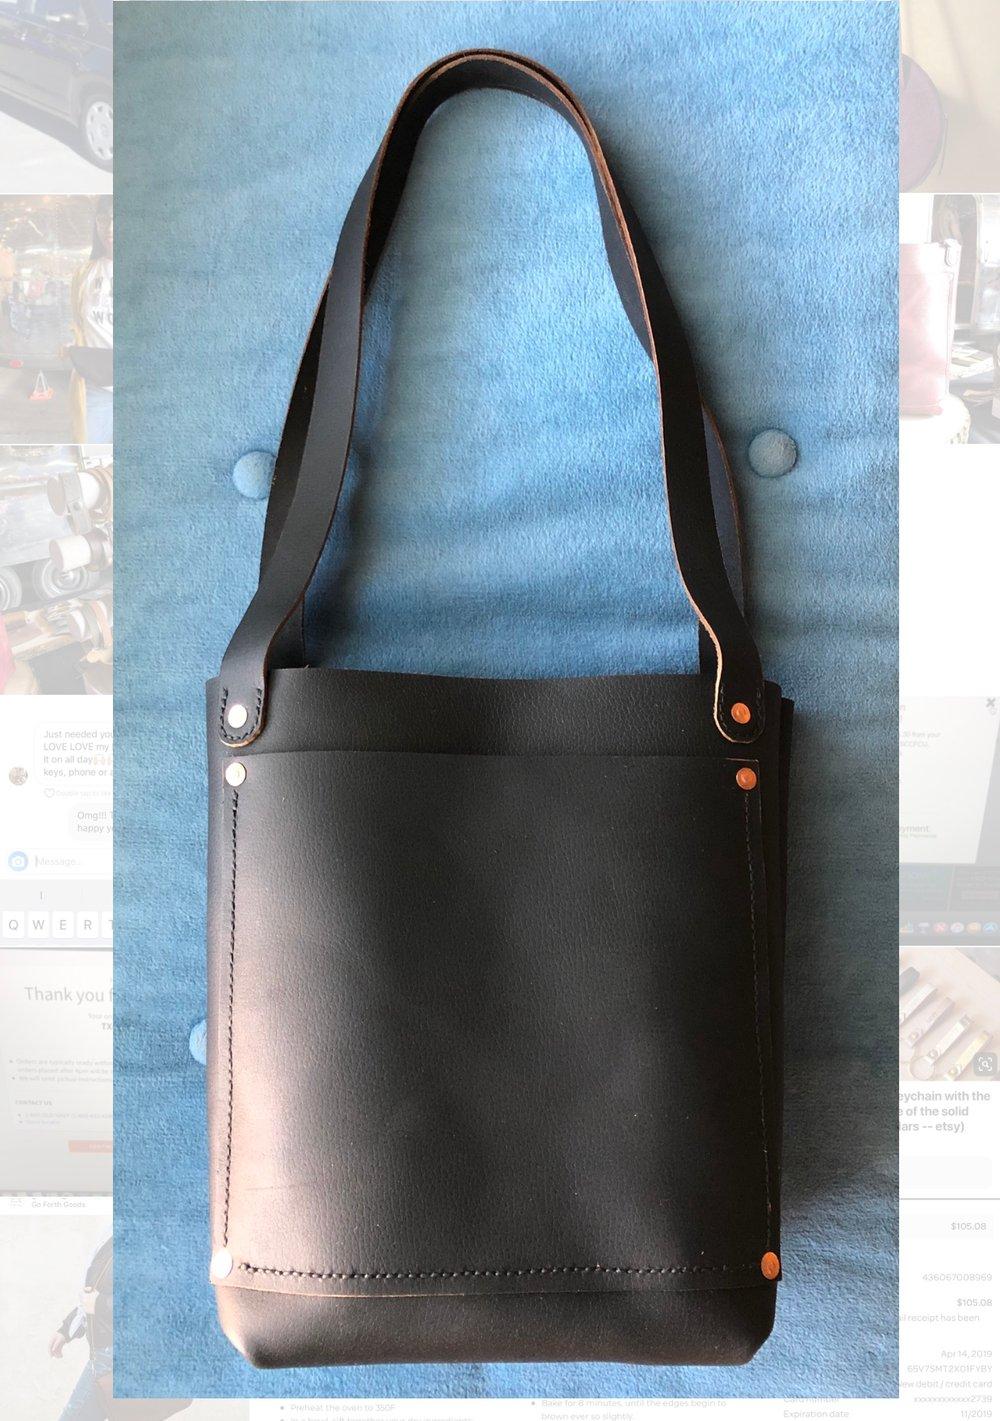 Image of Essential tote bag